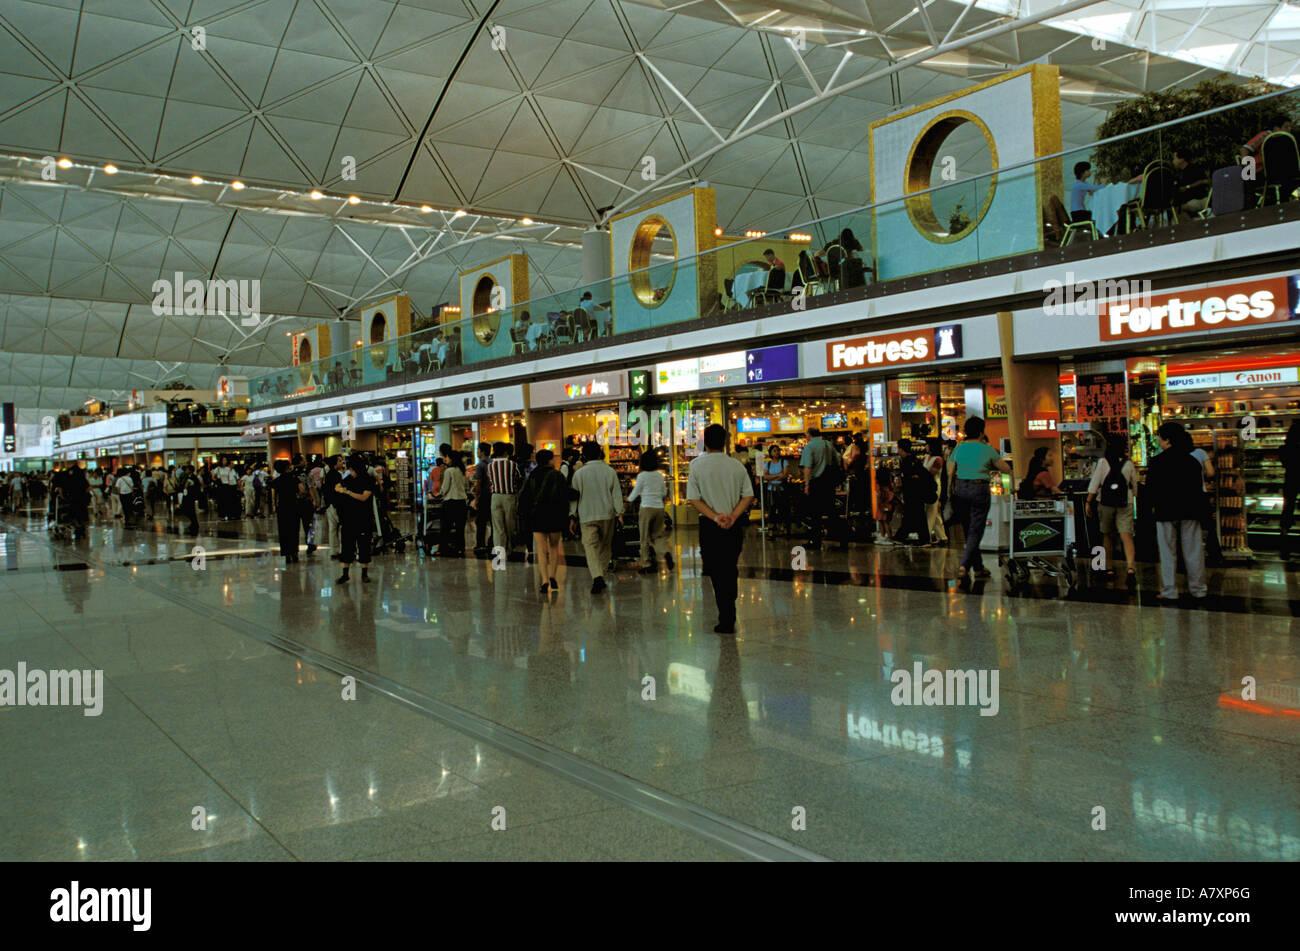 Asia, China, Hong Kong, Lantau Island. Chek Lap Kok Airport, airport shops - Stock Image